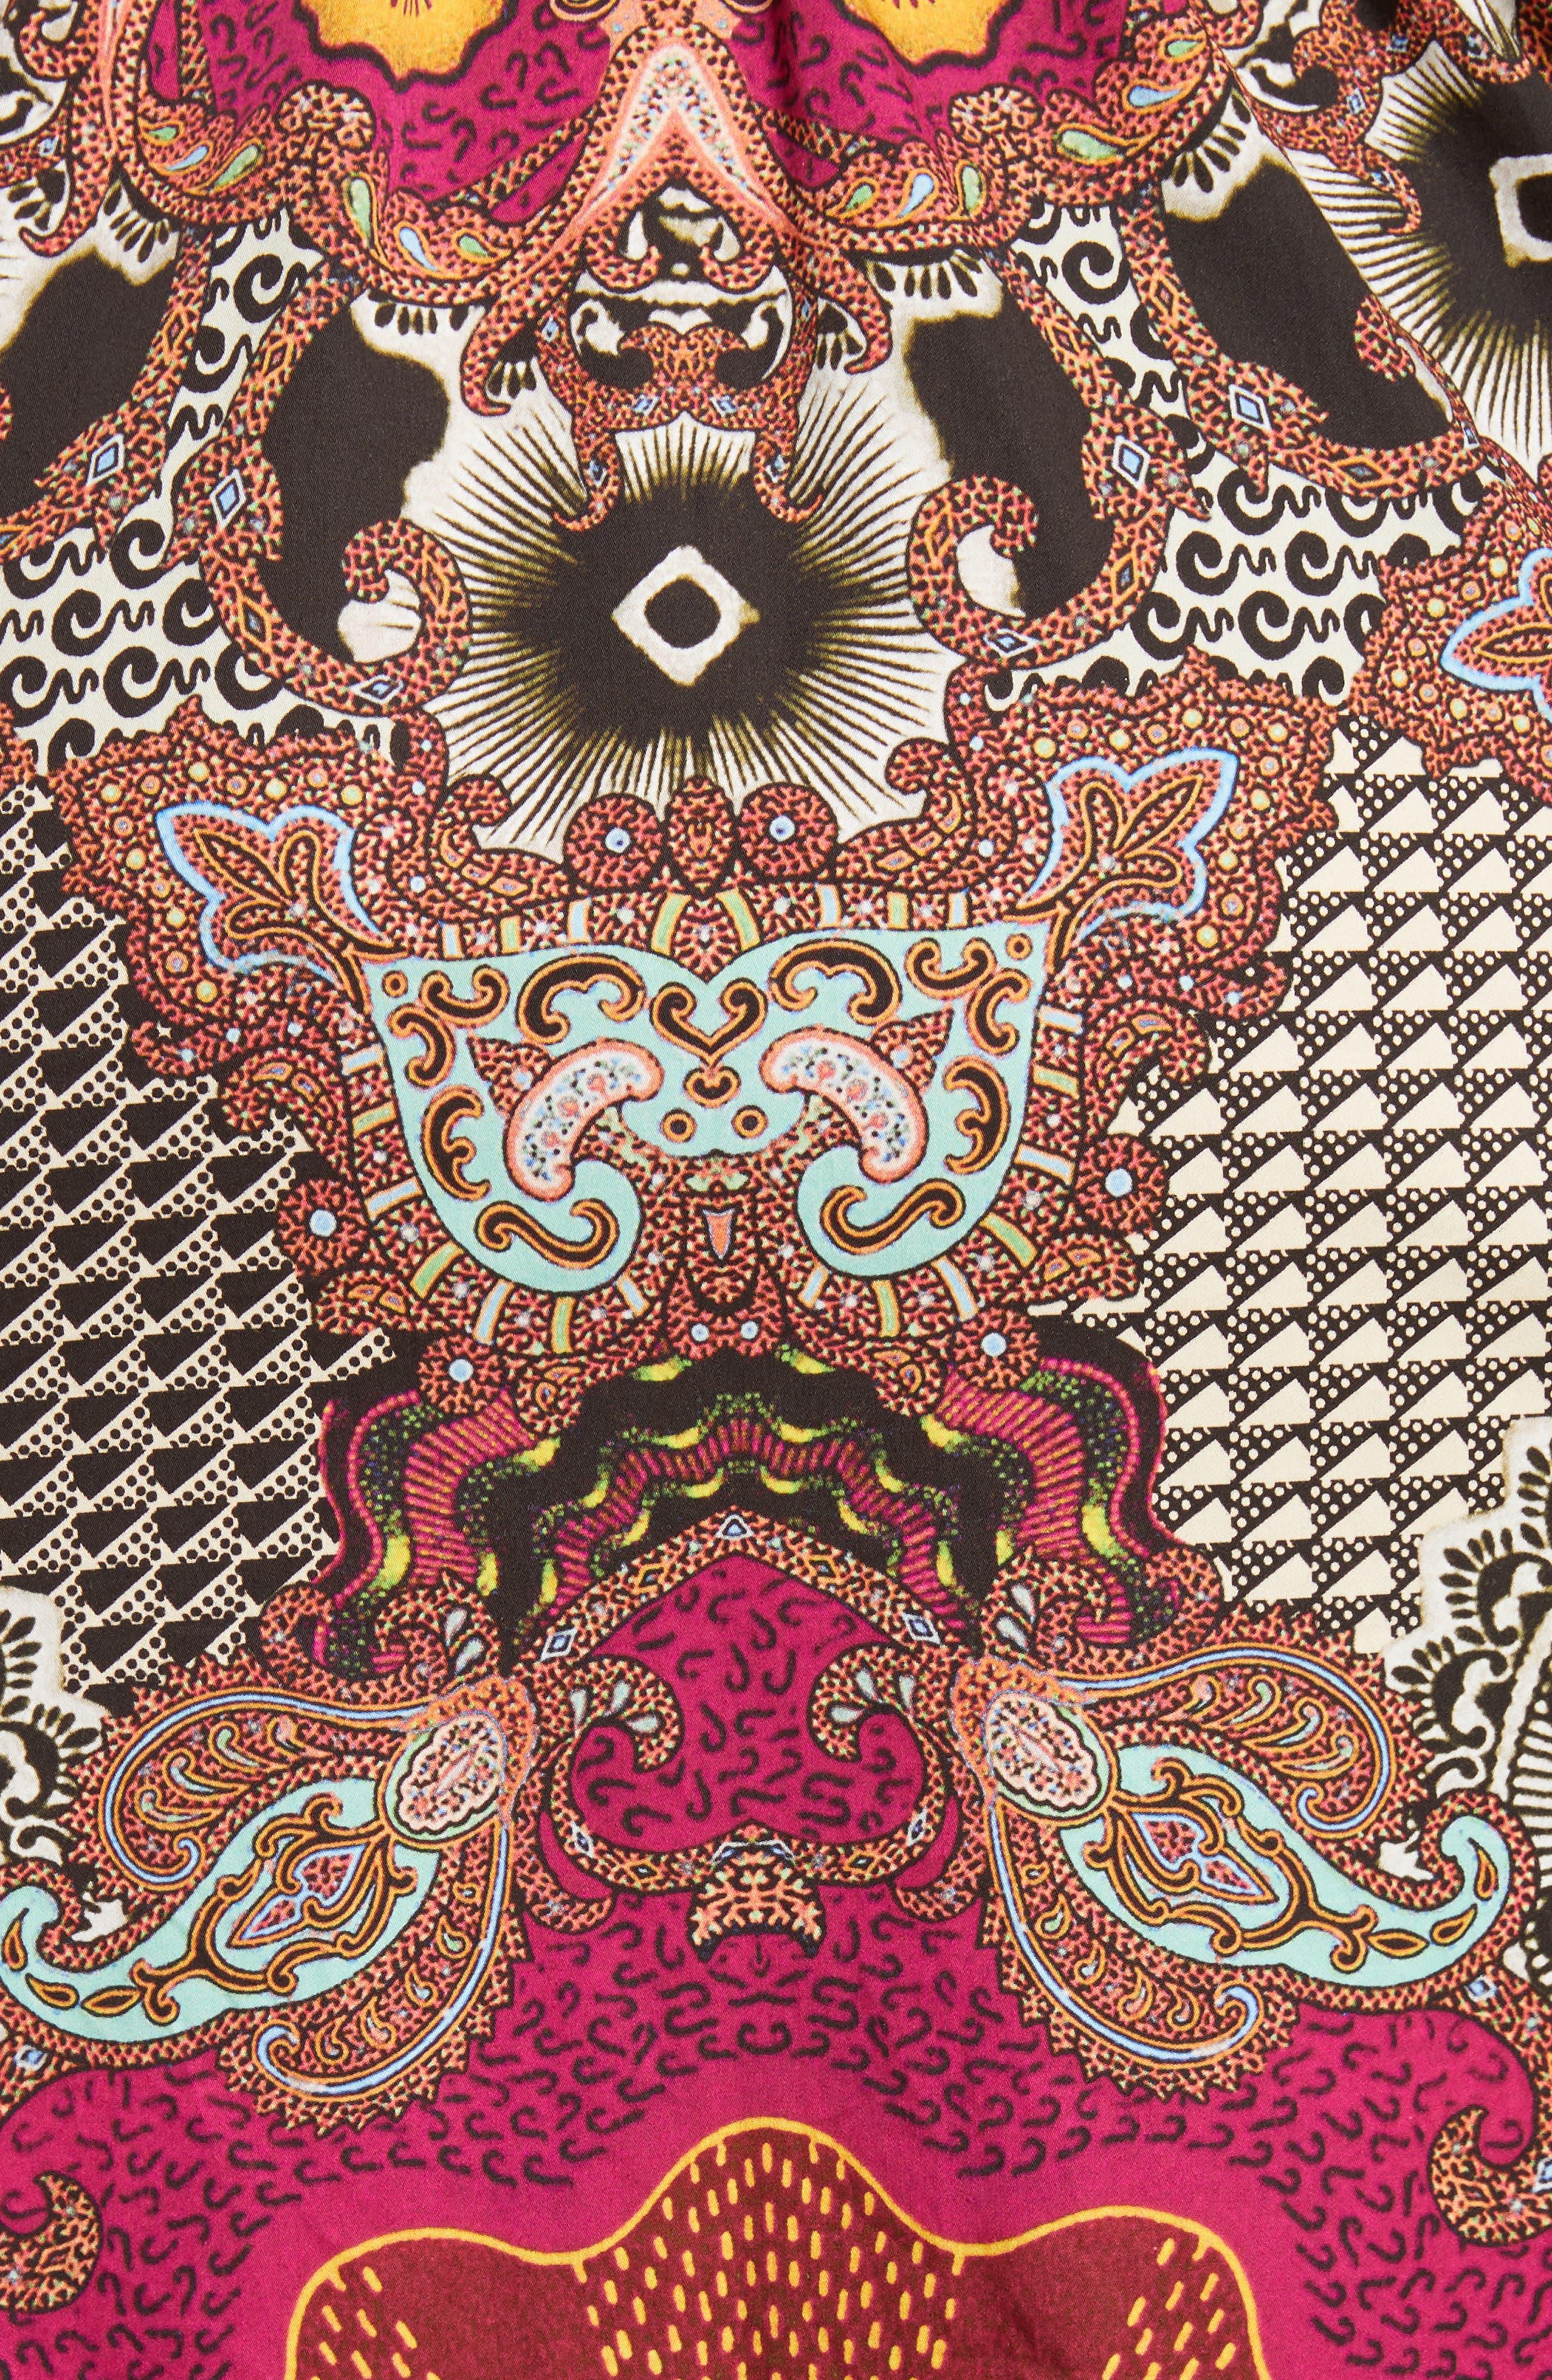 Jungle Paisley Print Cotton Dress,                             Alternate thumbnail 6, color,                             Black